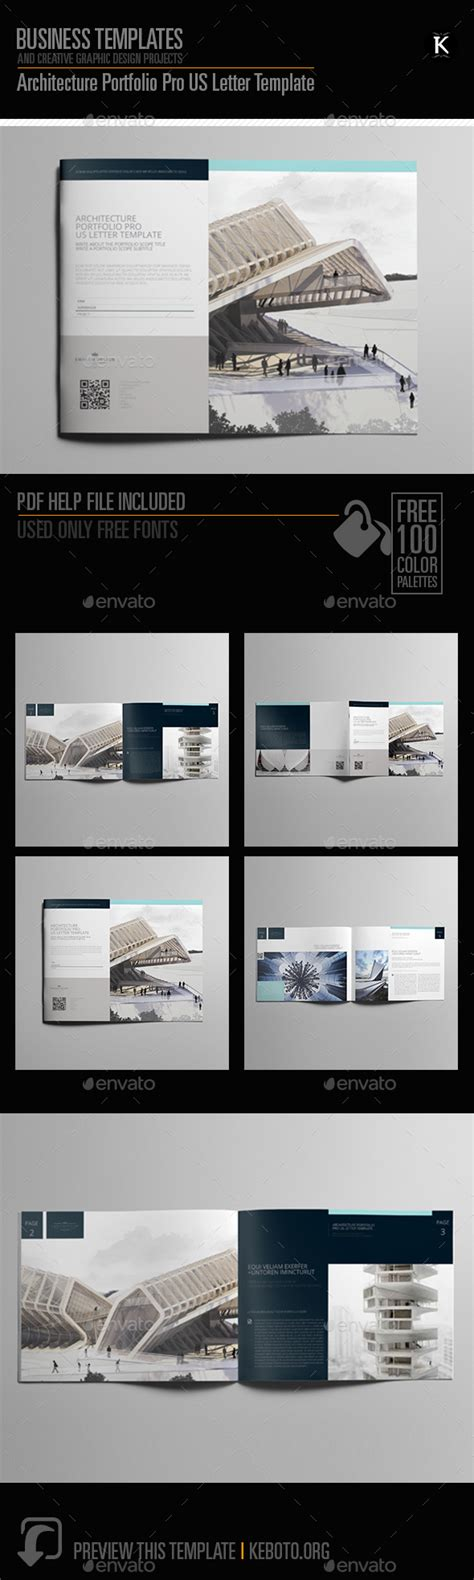 14827 architecture portfolio template architecture portfolio pro us letter template by keboto